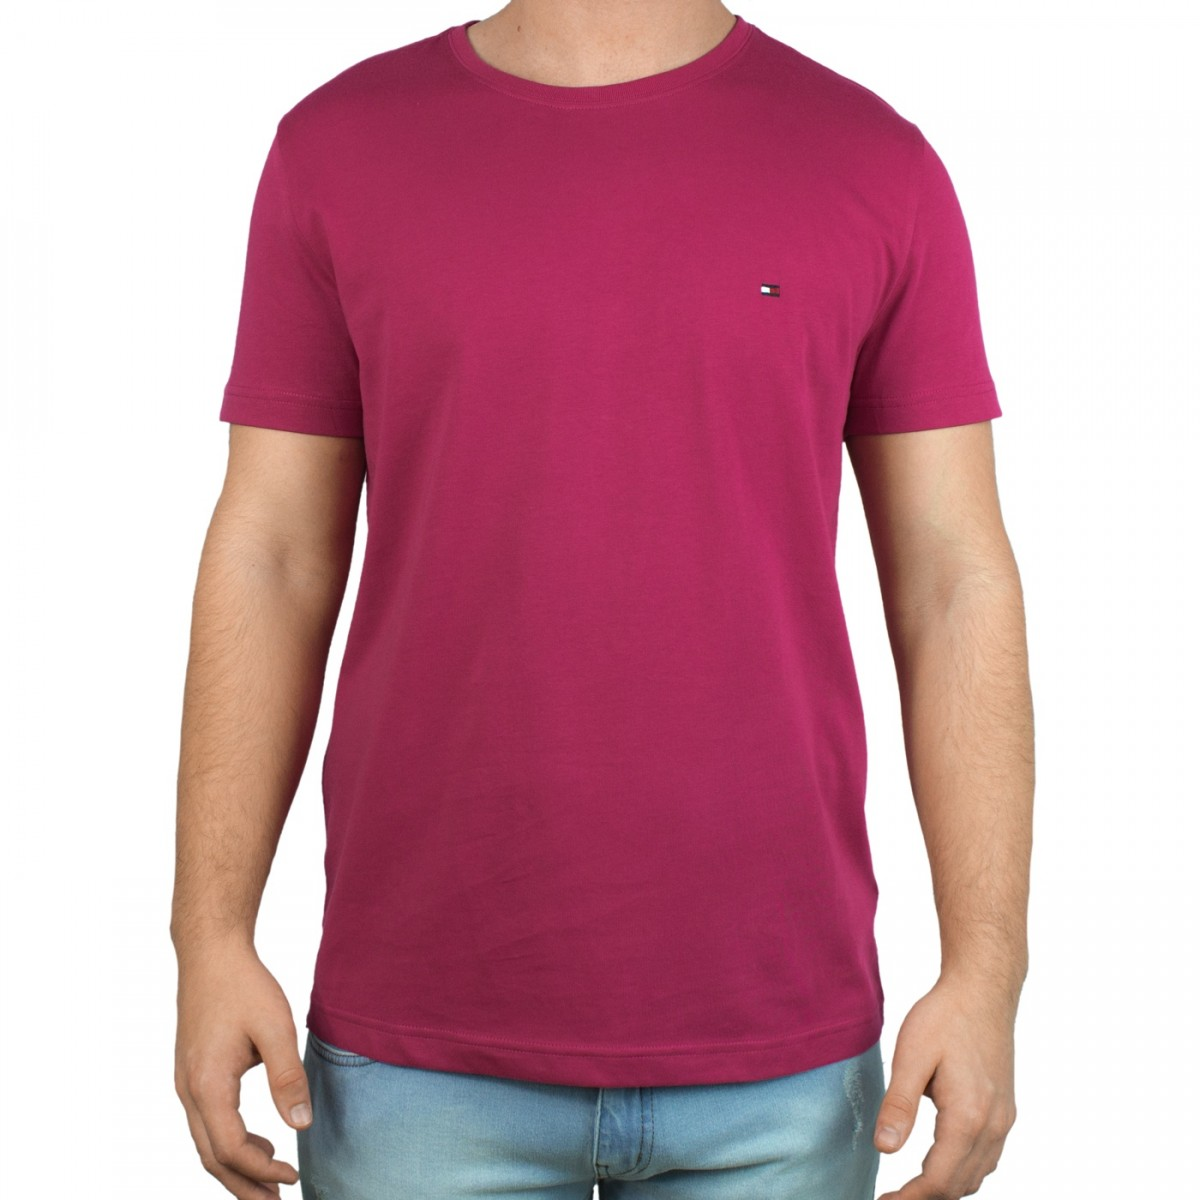 c61dba382cc66 Bizz Store - Camiseta Masculina Tommy Hilfiger Gola Redonda